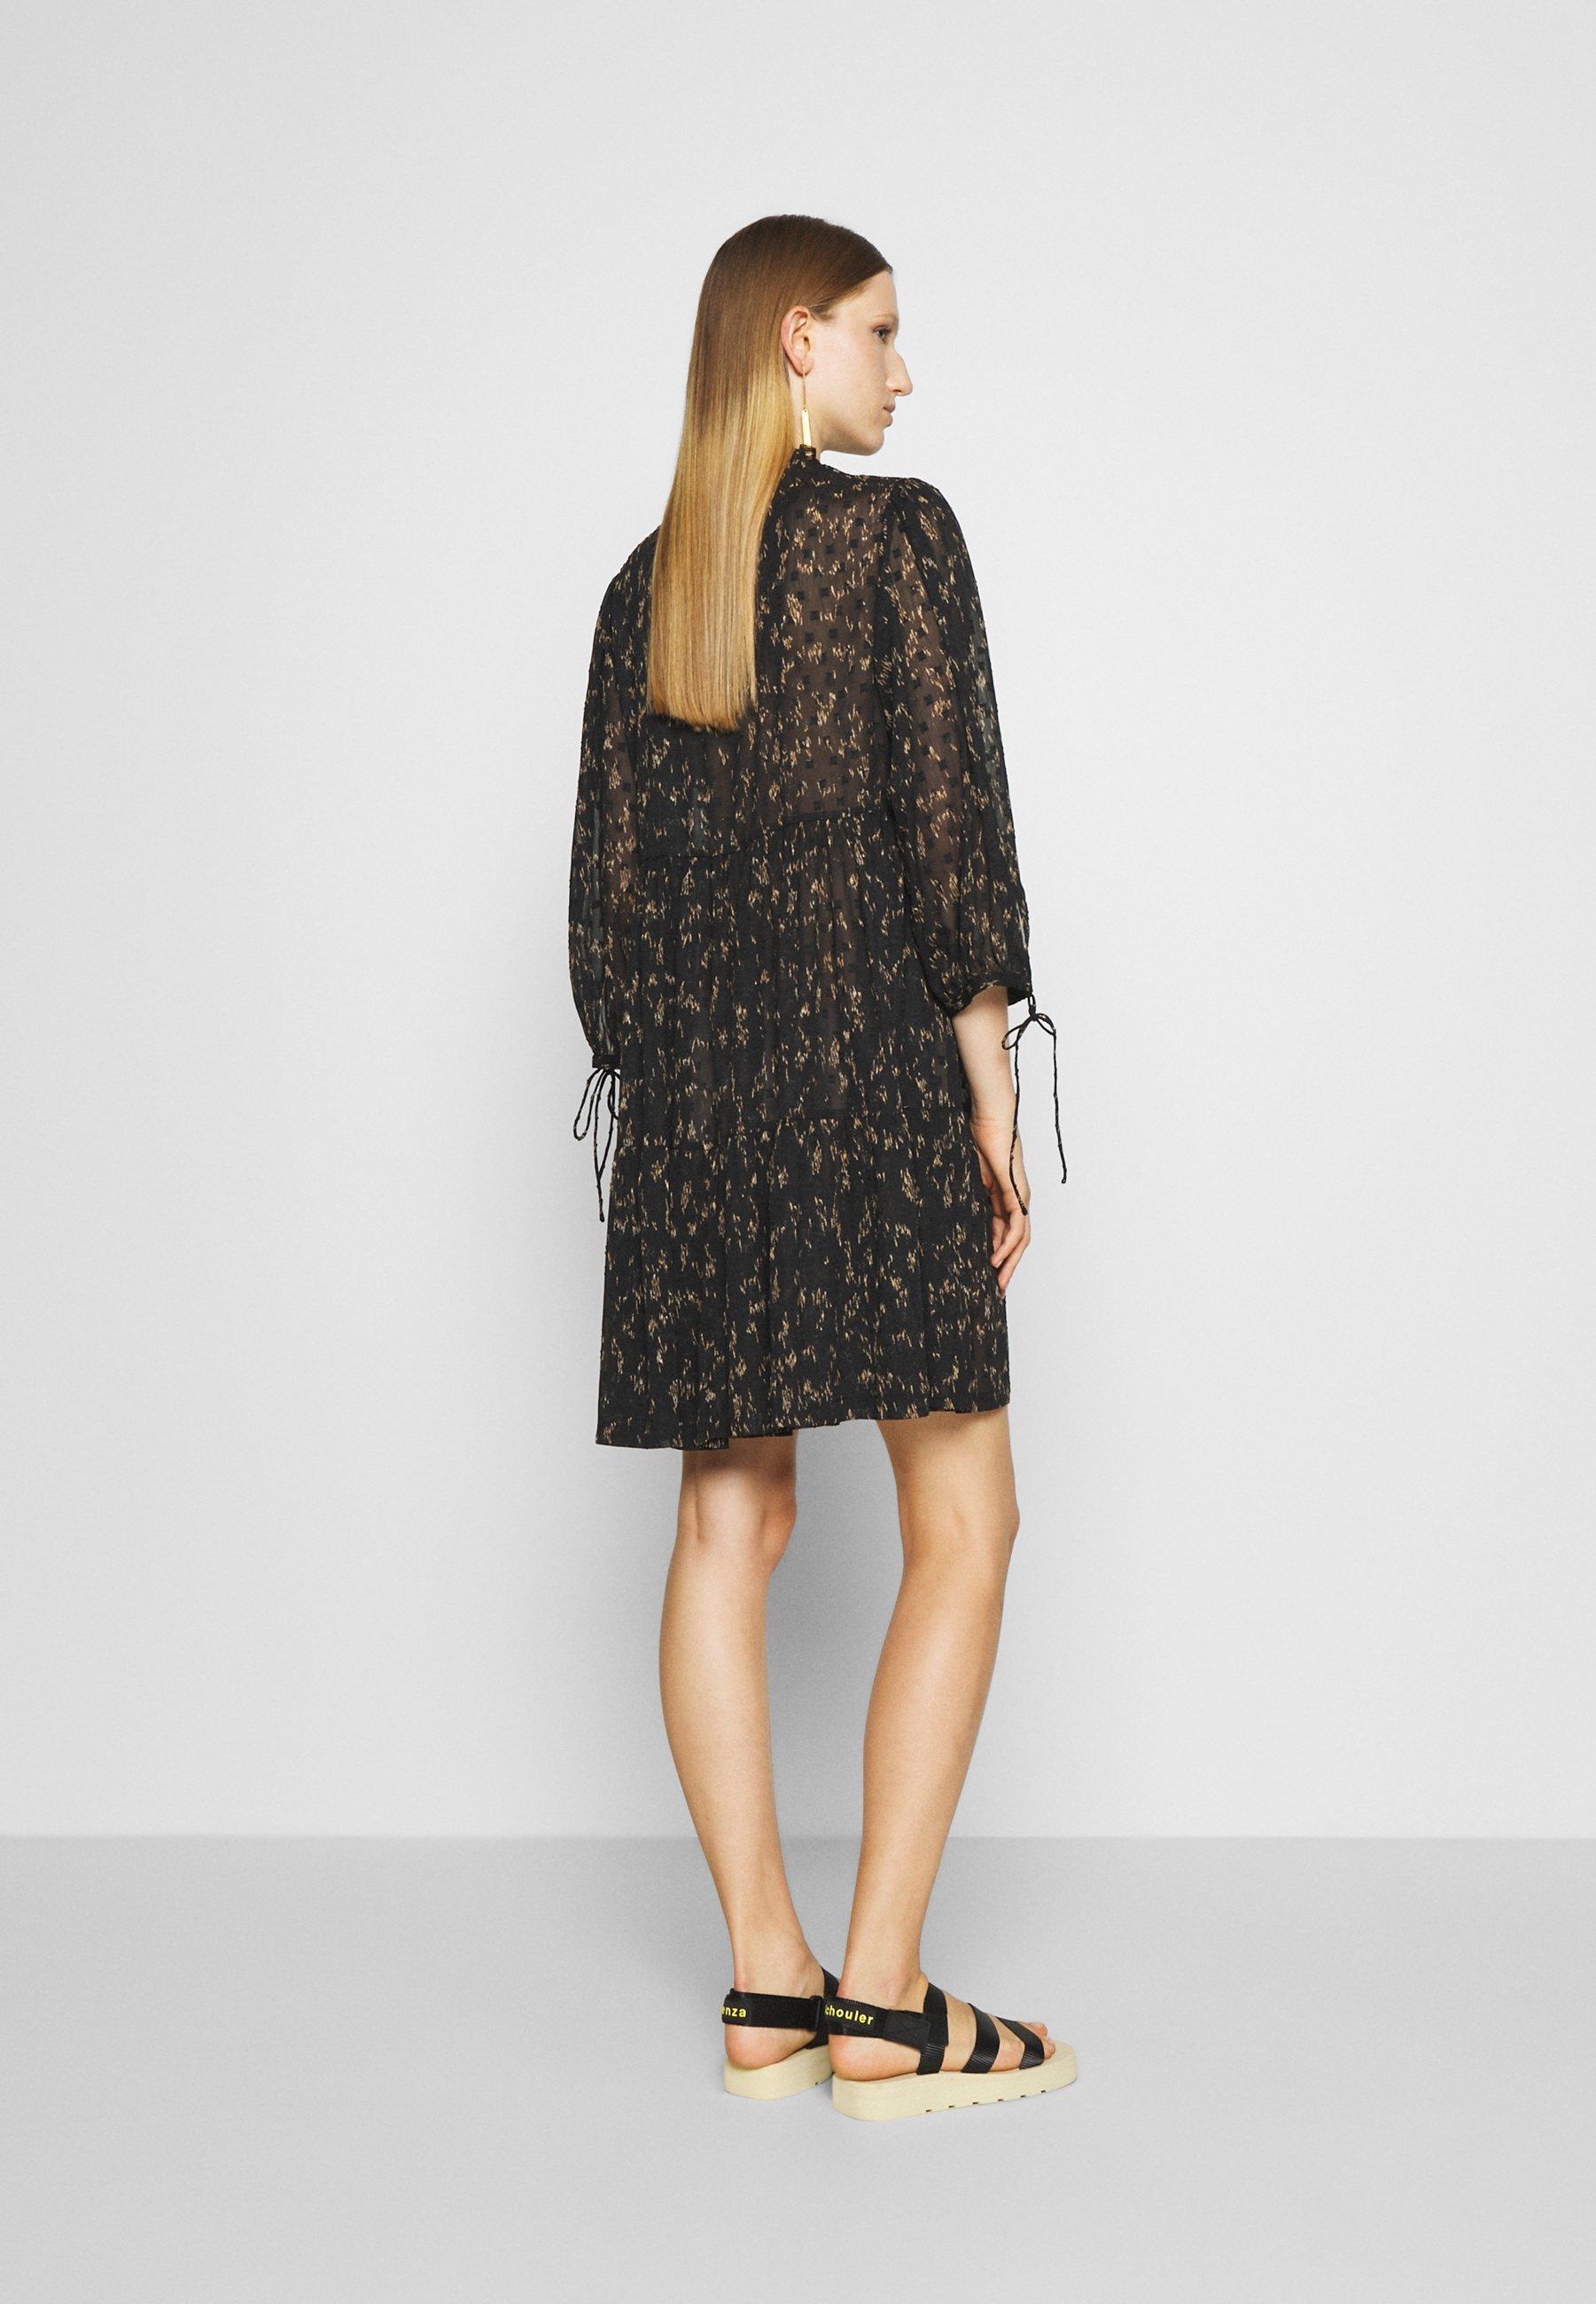 100% Guaranteed Women's Clothing DESIGNERS REMIX KIELY DRESS Day dress black/camel awHqoLkz1